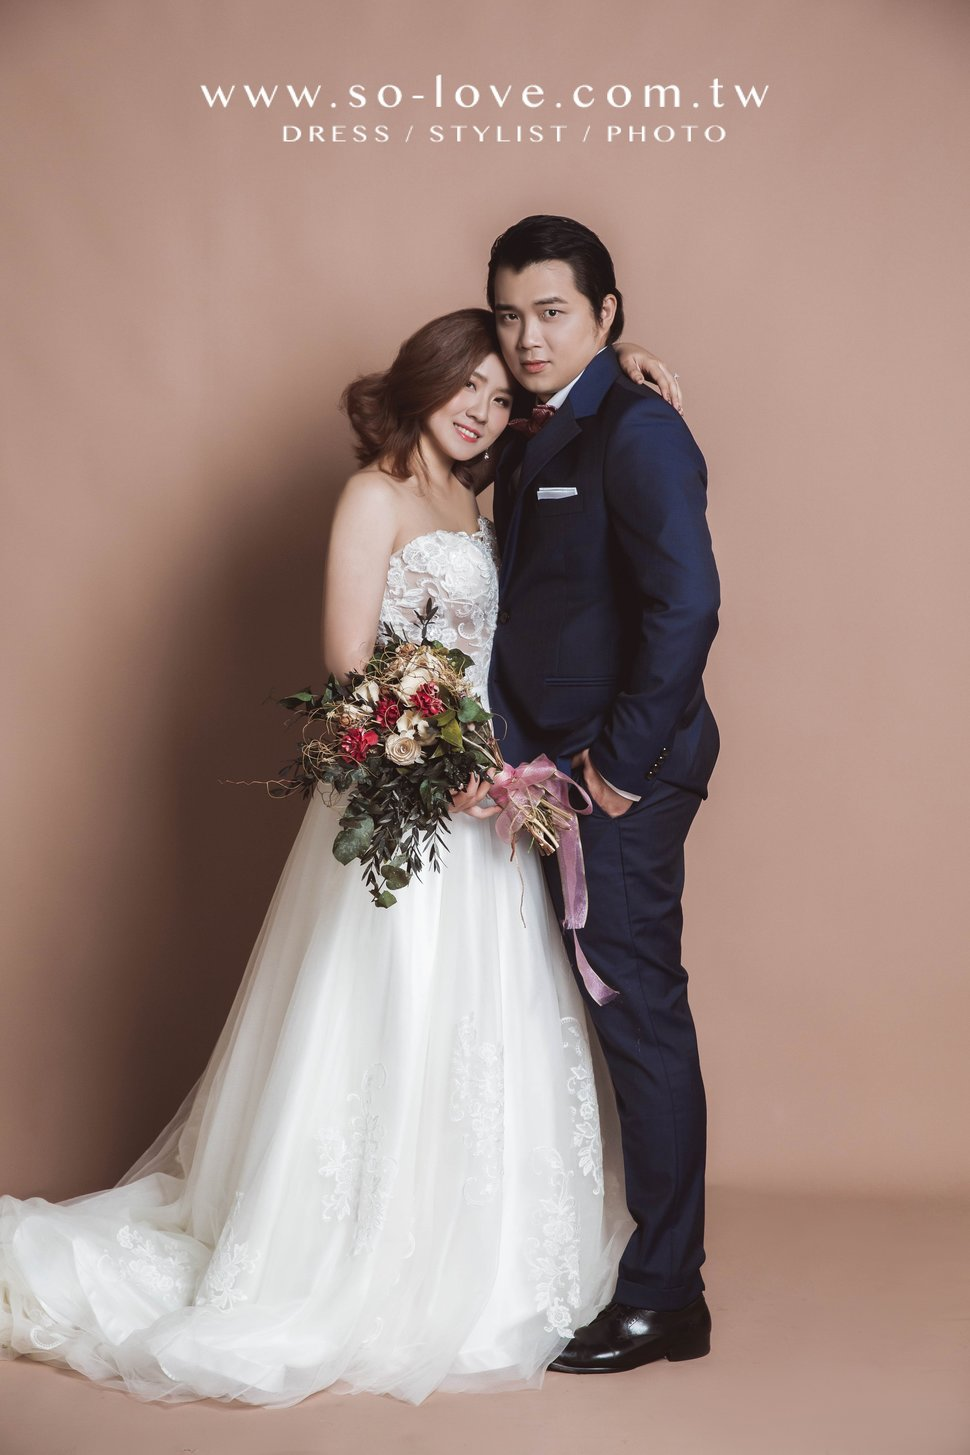 YCG2B8228 - So.Love Wedding 樂樂蕾絲《結婚吧》